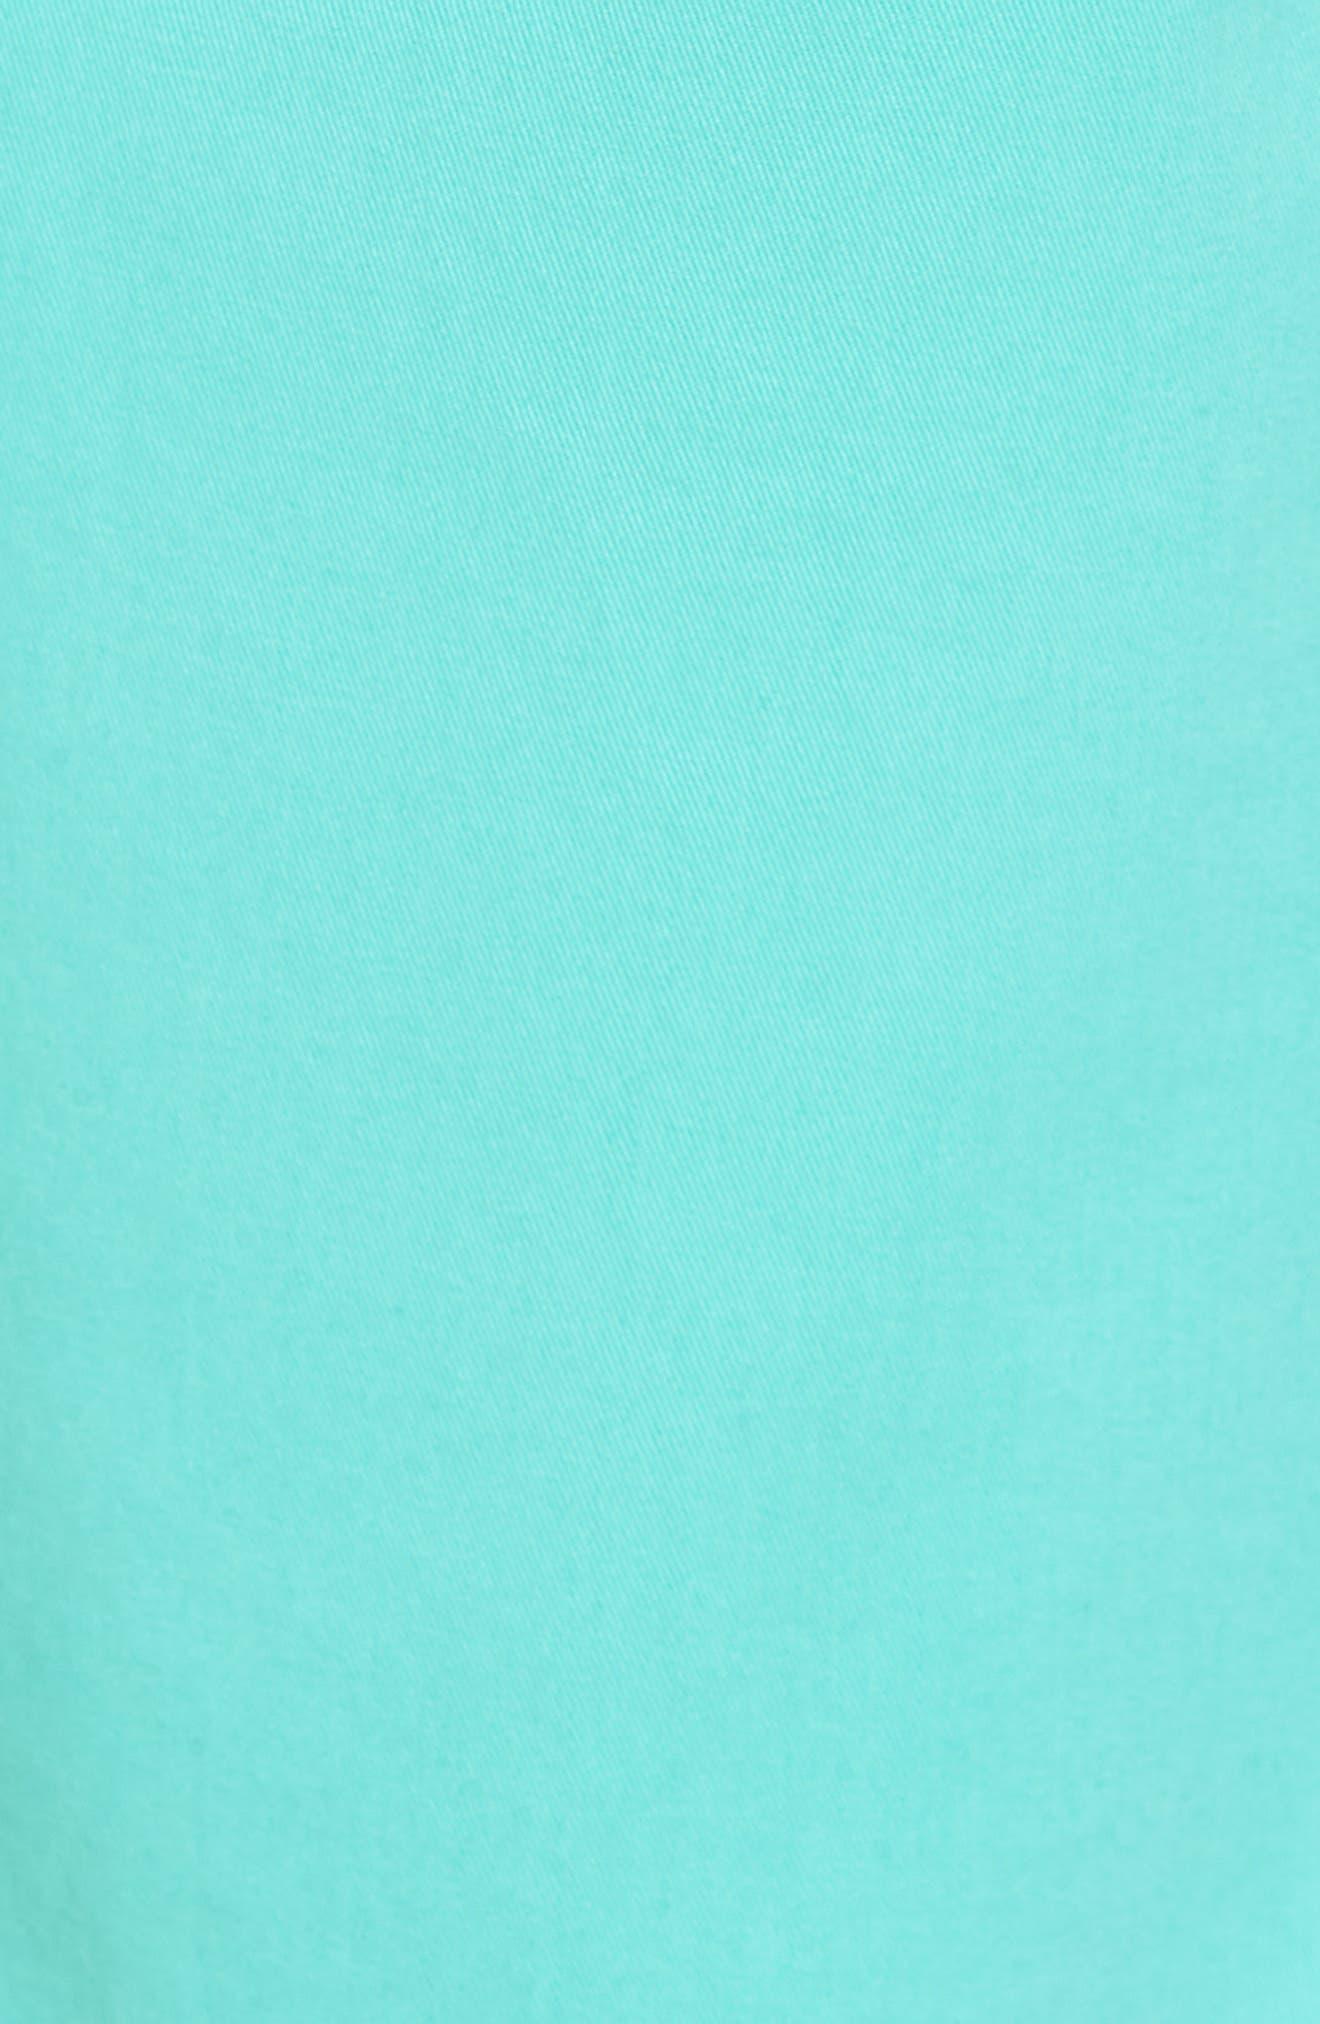 Ballard Slim Fit Stretch Chino 11-Inch Shorts,                             Alternate thumbnail 69, color,